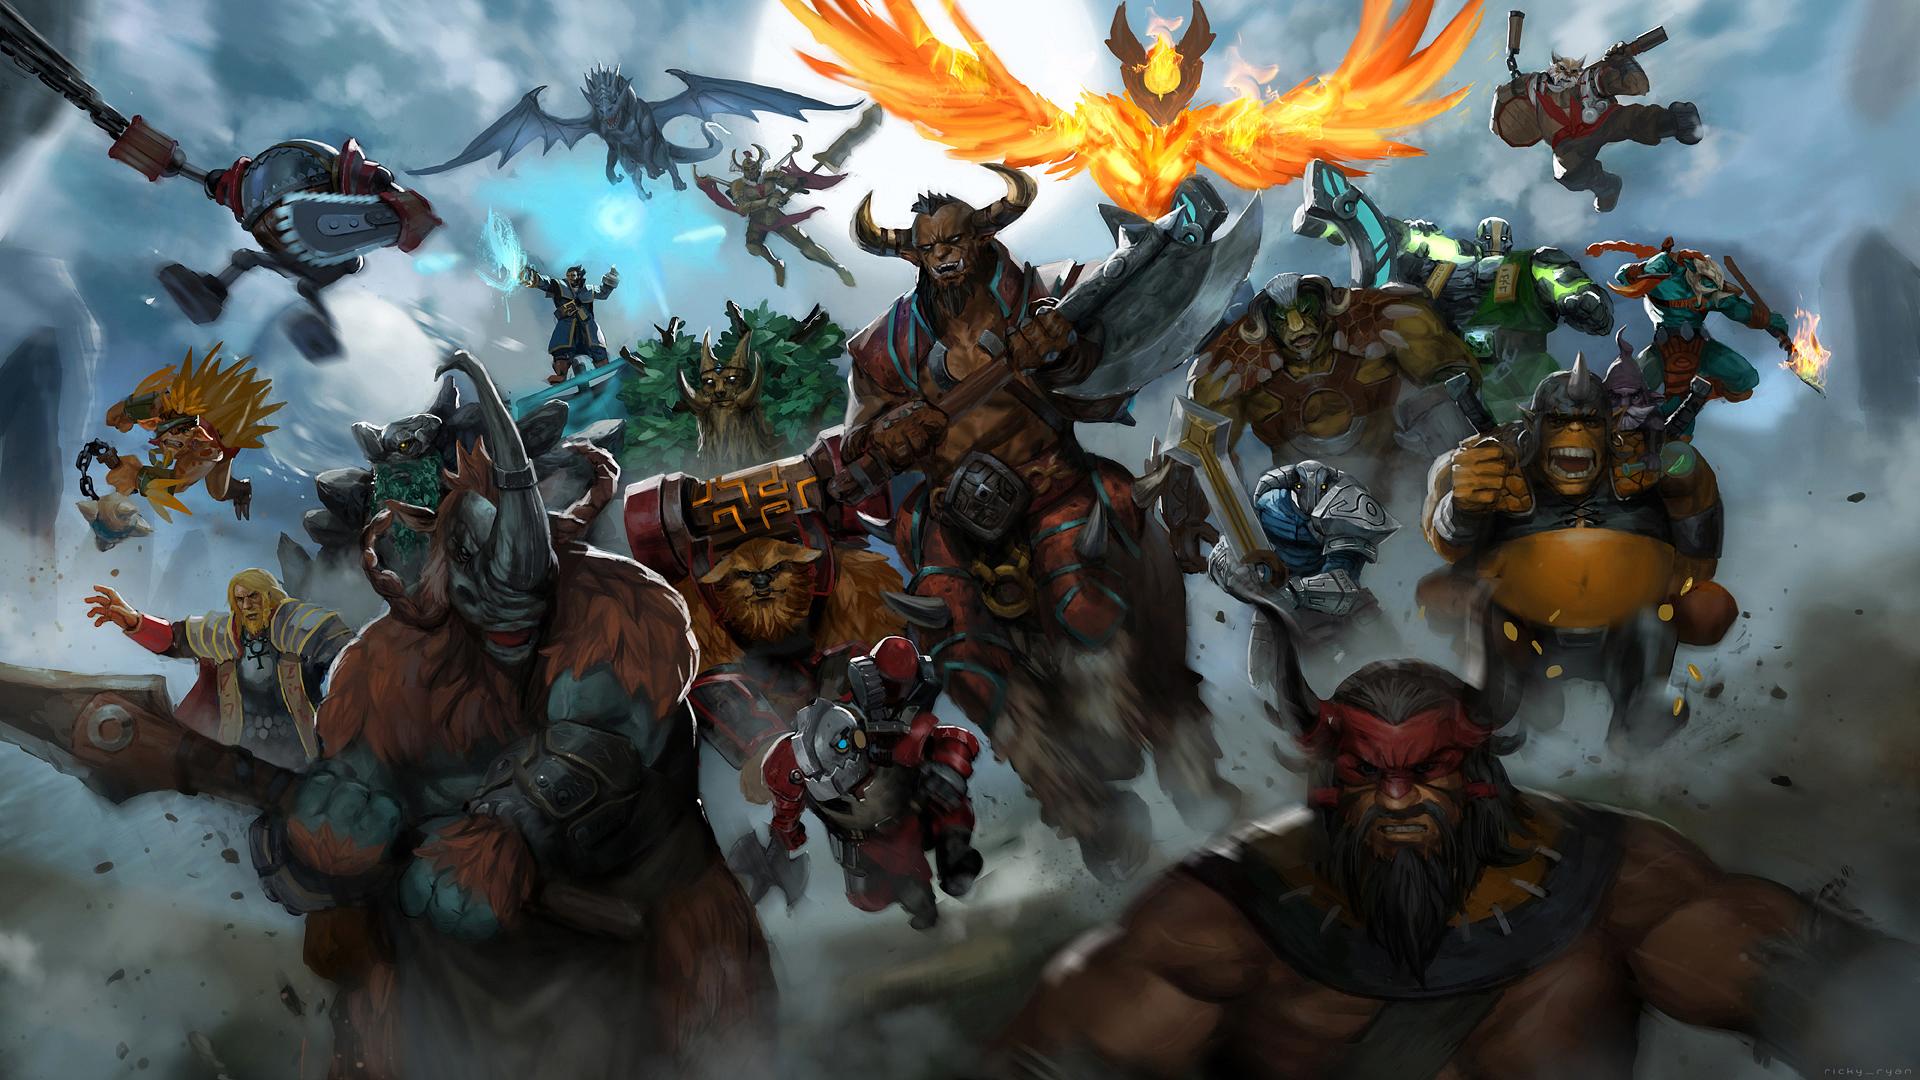 Dota 2 Epic Heroes Wallpaper HD 1920x1080